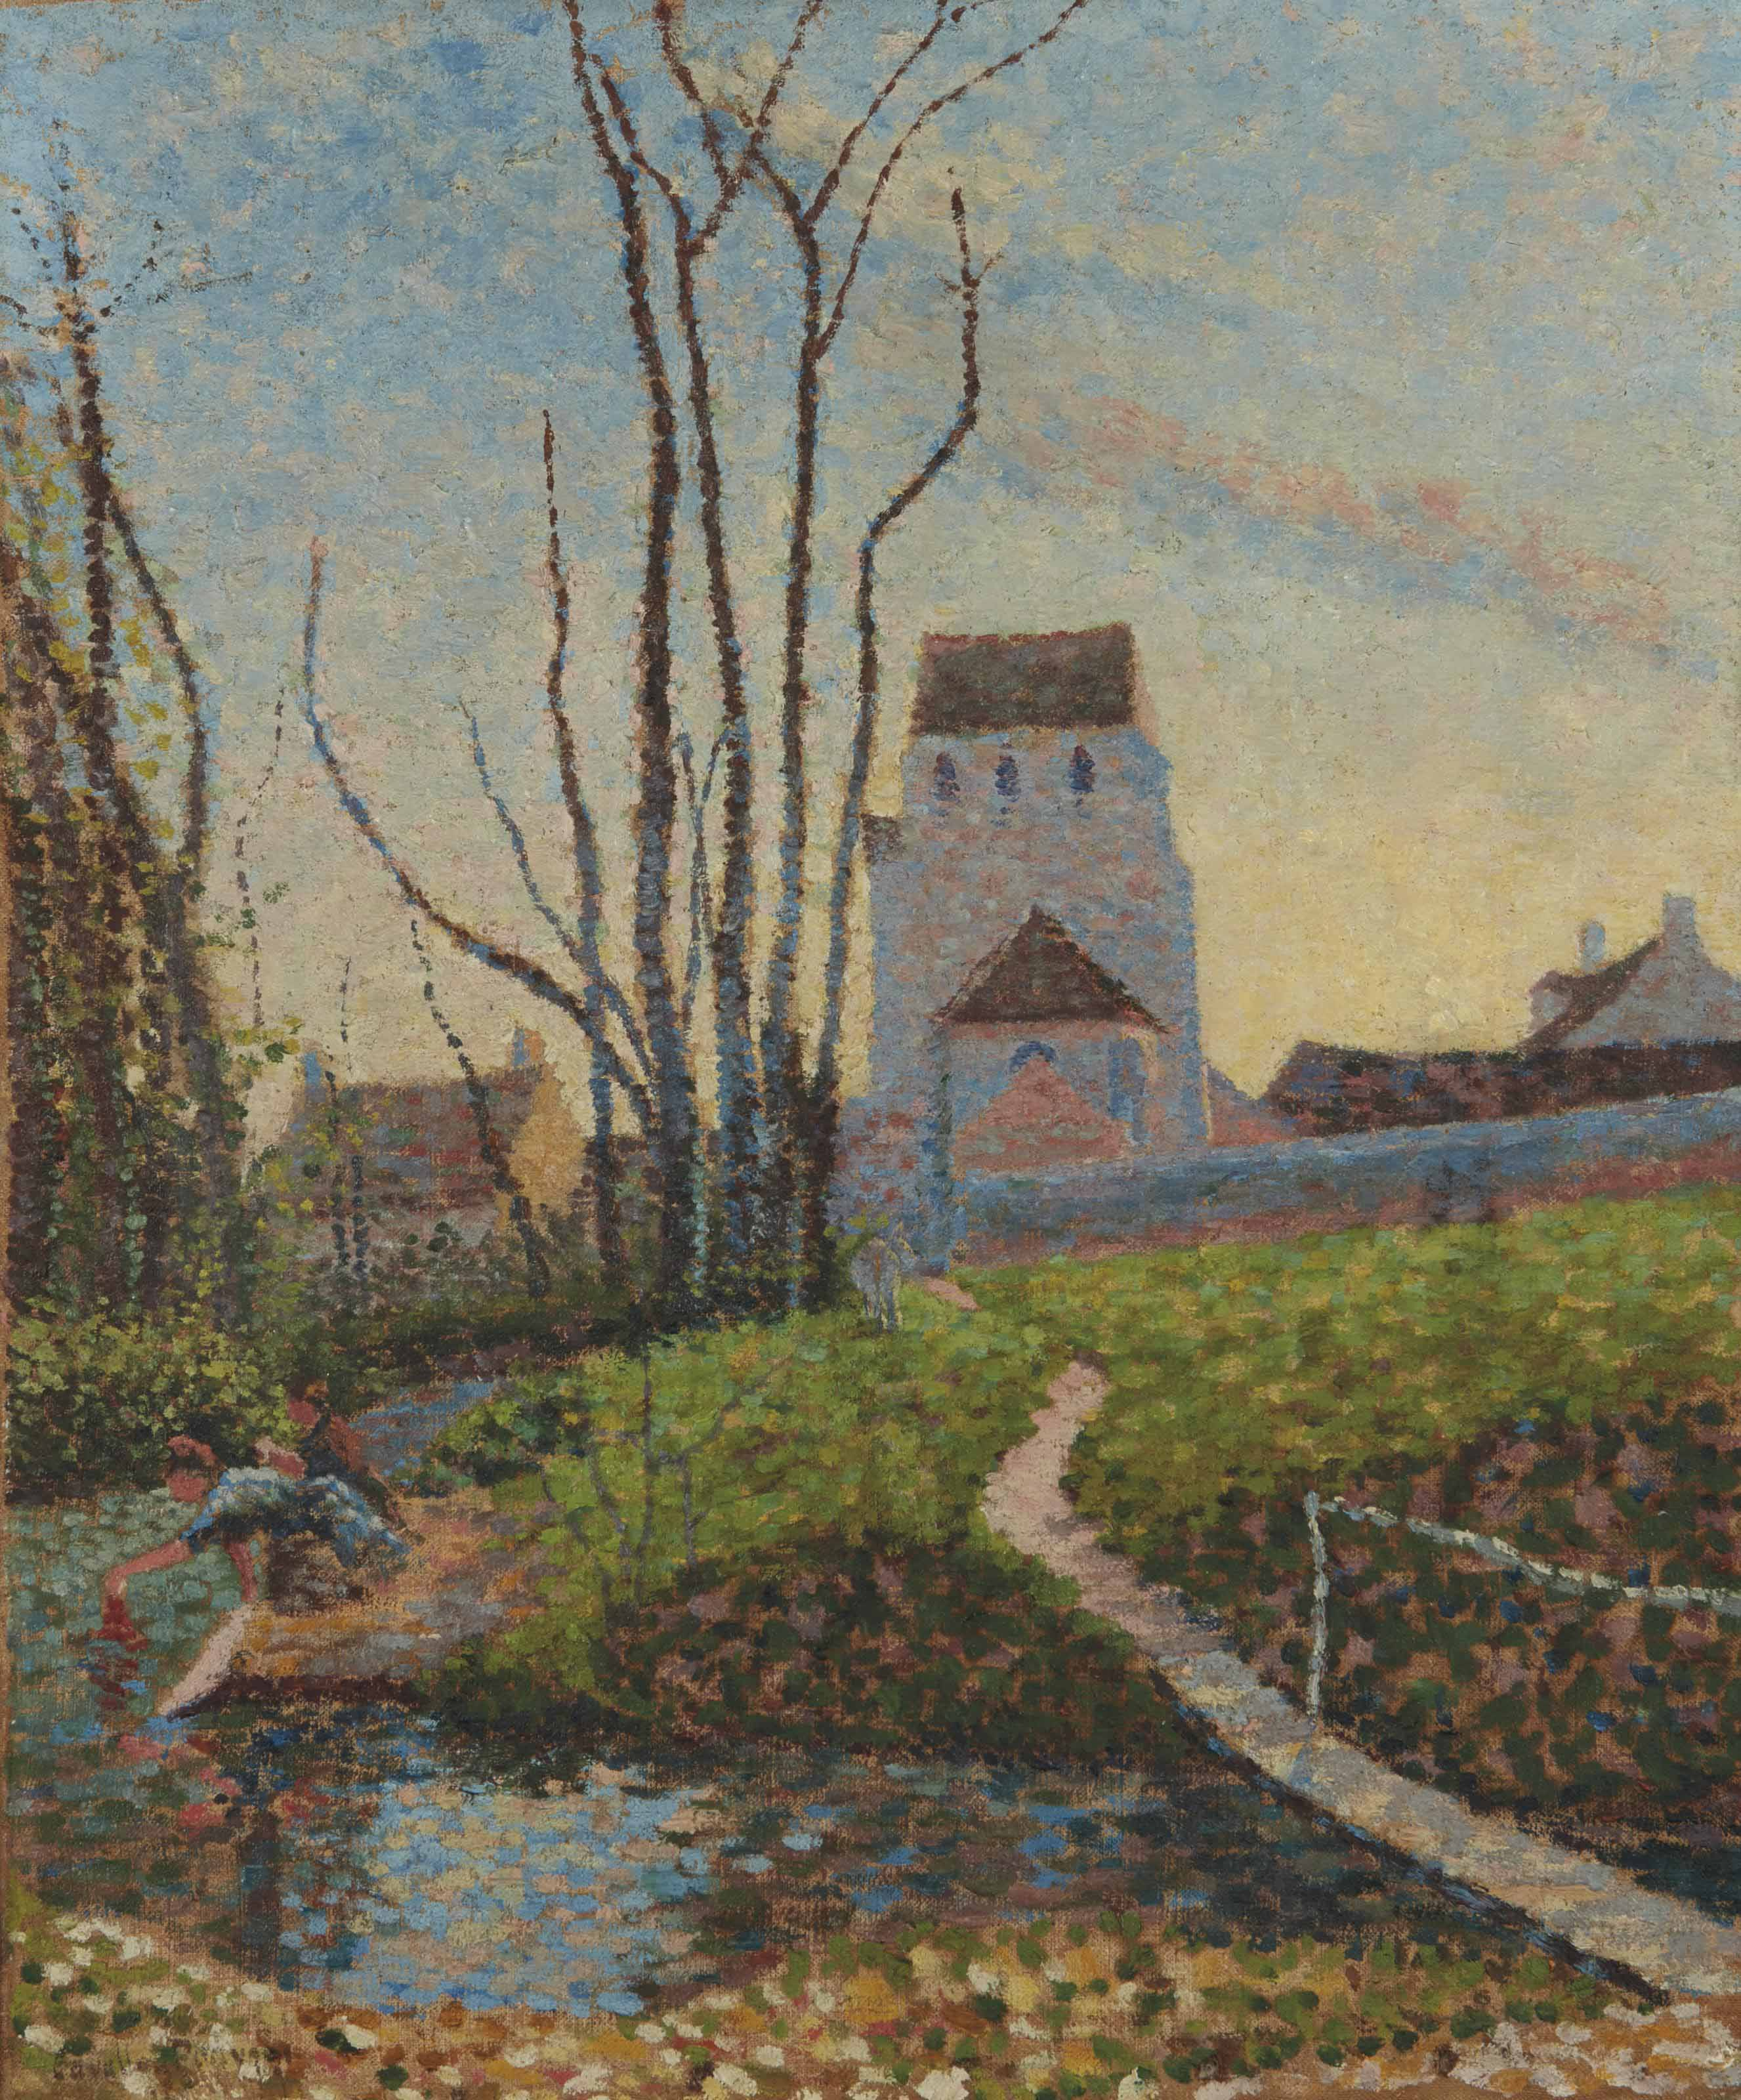 Emile-Gustave Cavallo-Peduzzi